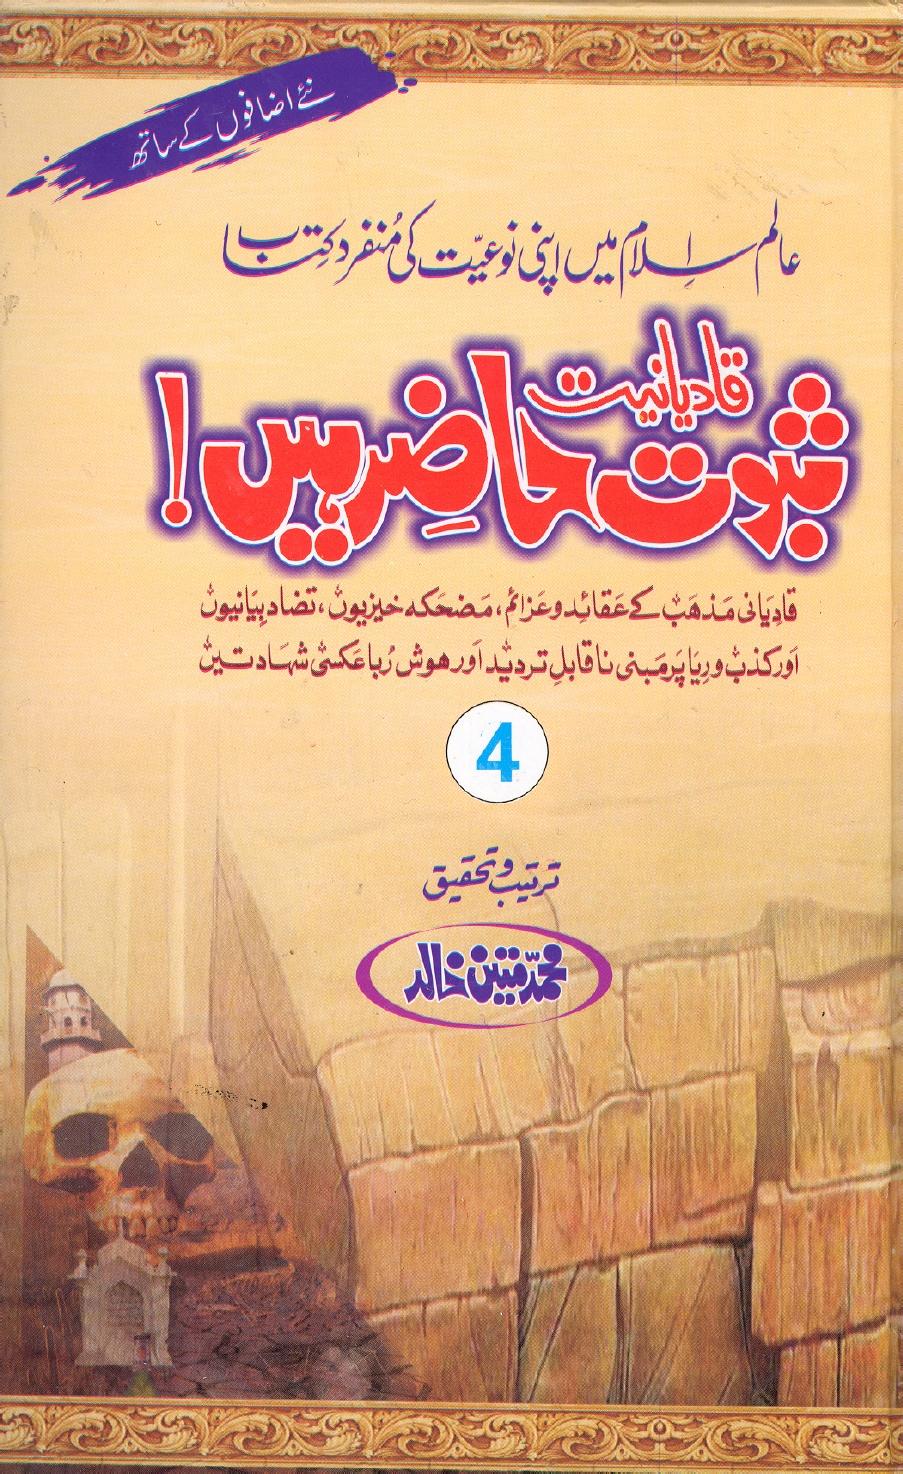 Qadianiat Saboot Hazir Hain J 4